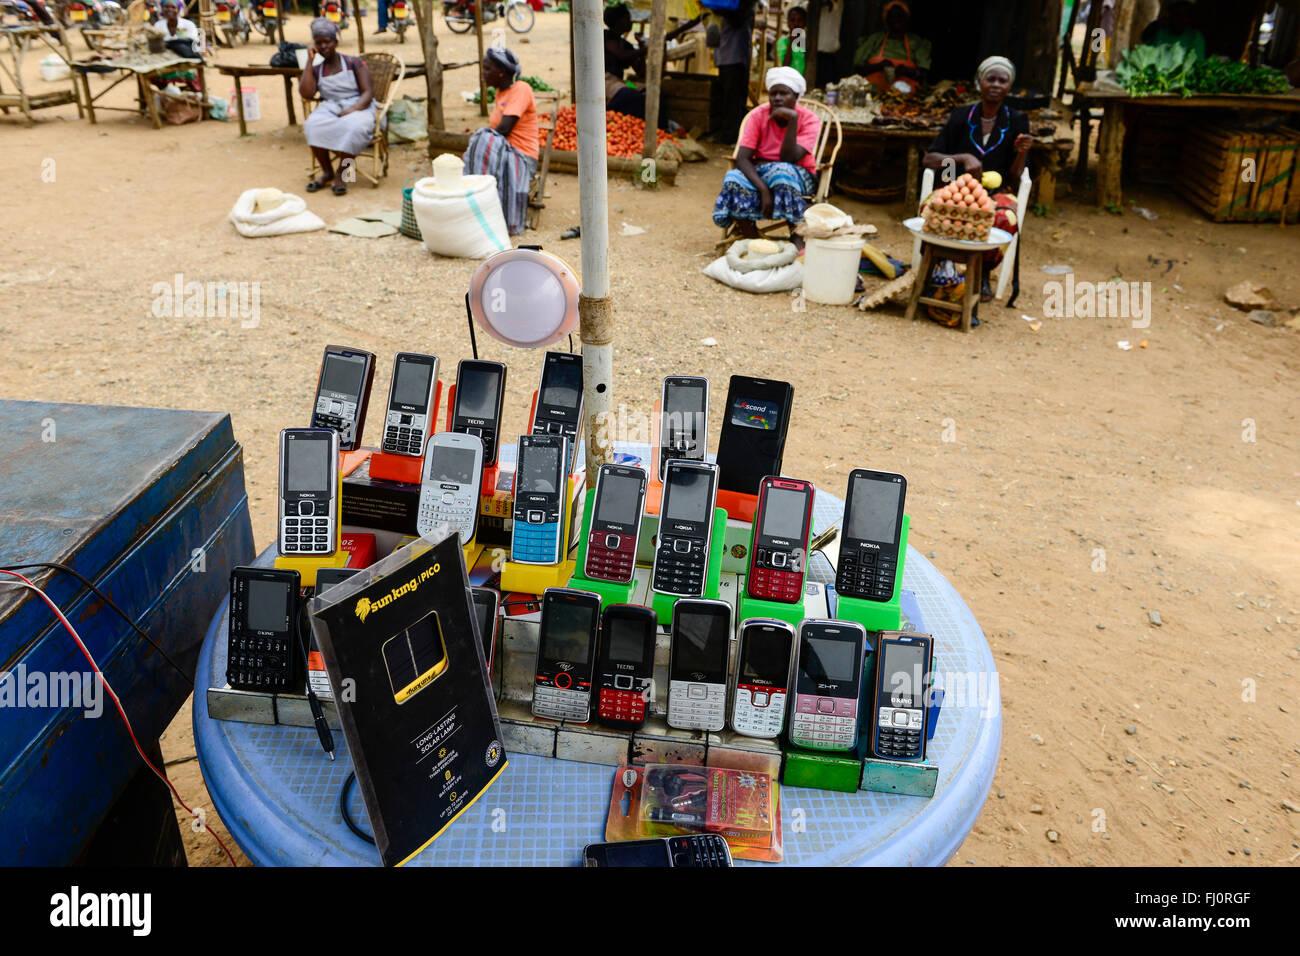 KENYA, Bukura, street vendoor selling mobile phones of Nokia, Tecno, oking / KENIA, County Kakamega, Bukura, Markt - Stock Image